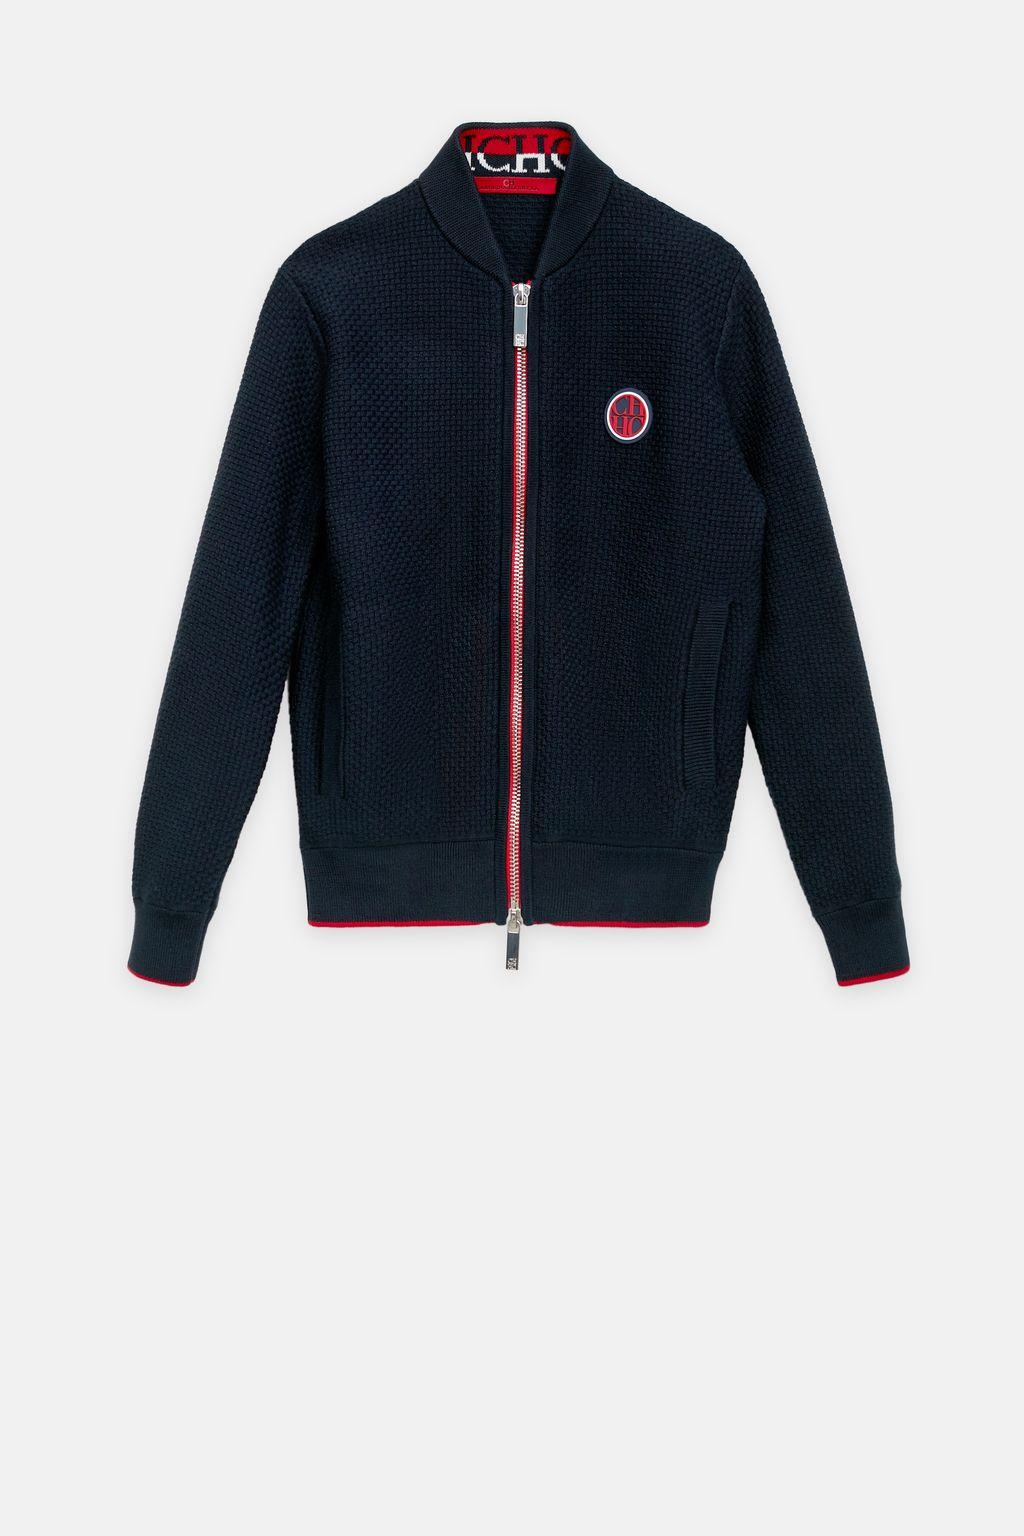 Structured knit bomber jacket